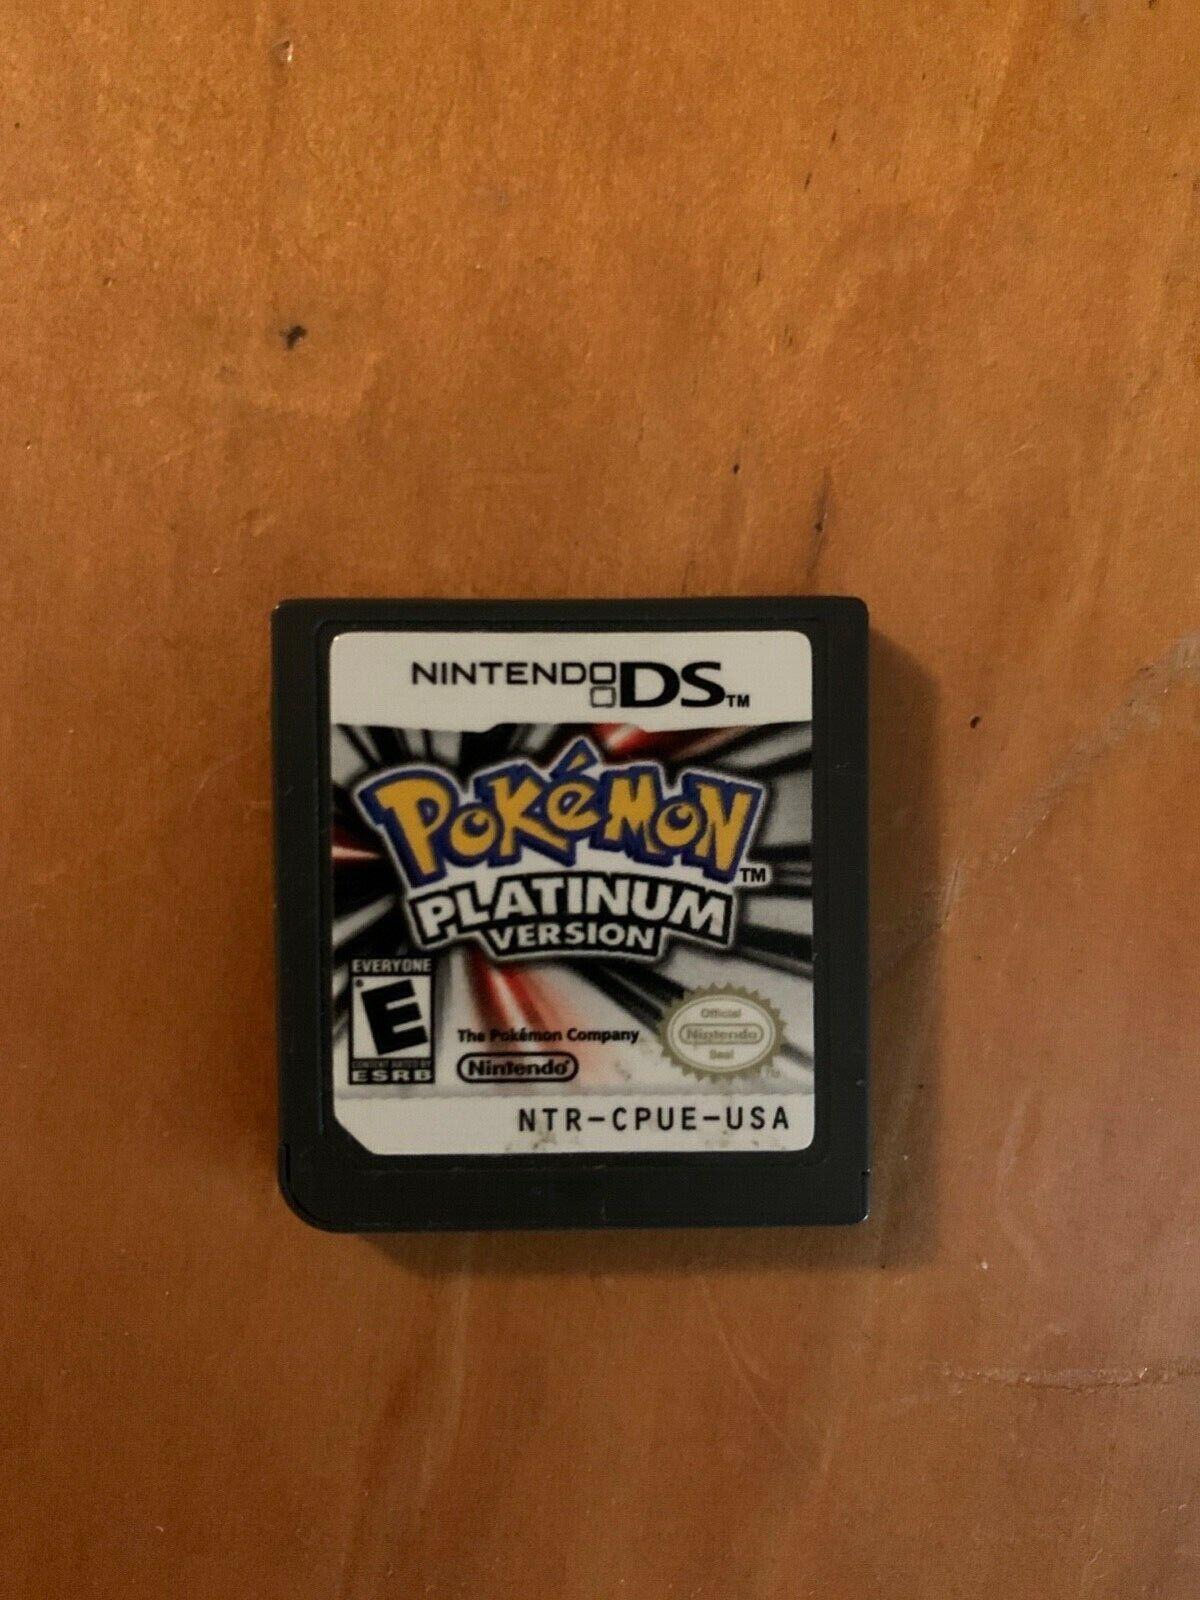 Pok mon Platinum Version Nintendo DS, 2009  - $60.00